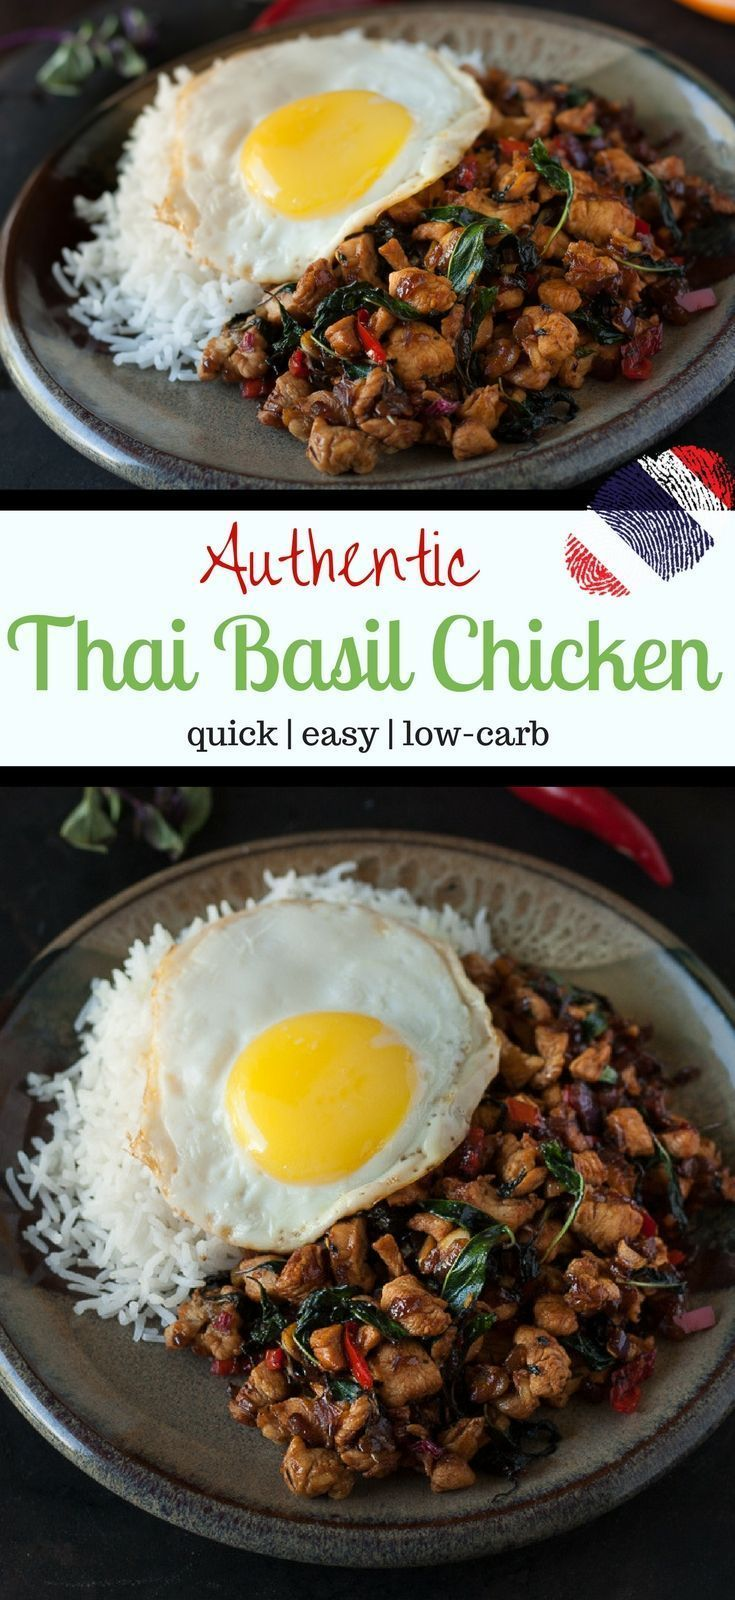 Thai Basil Chicken - Spicy Chicken Stir-Fry with Thai Basil & Thai Chillies { Gai Pad Kra Pao | Pad Krapow } | Quick & Easy Thai Streetfood Recipes